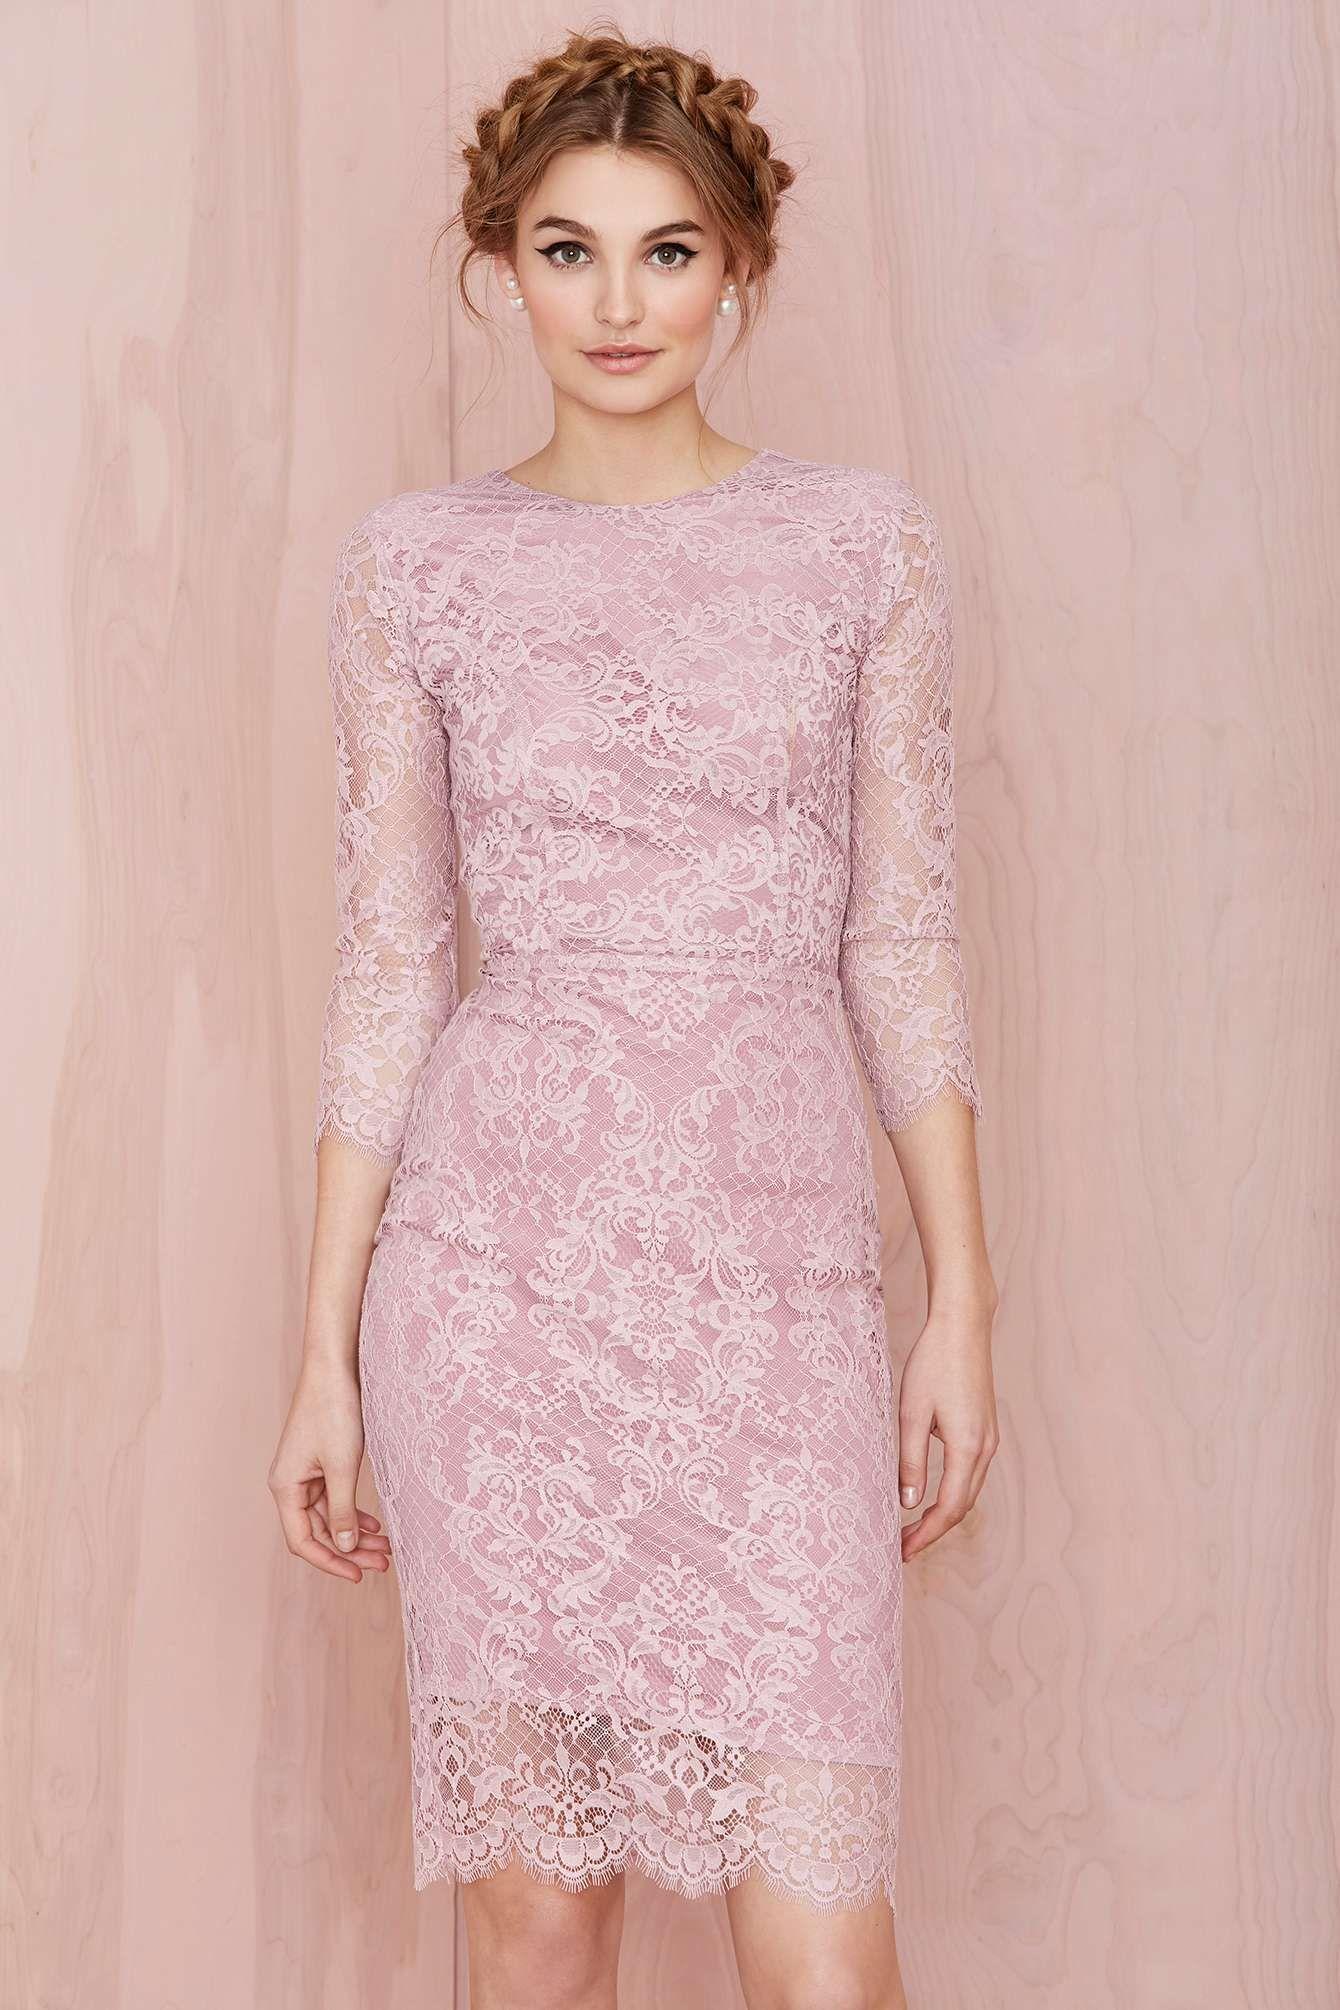 43982.1.zoom.jpg (1340×2010) | Coctail dress | Pinterest | Encaje ...